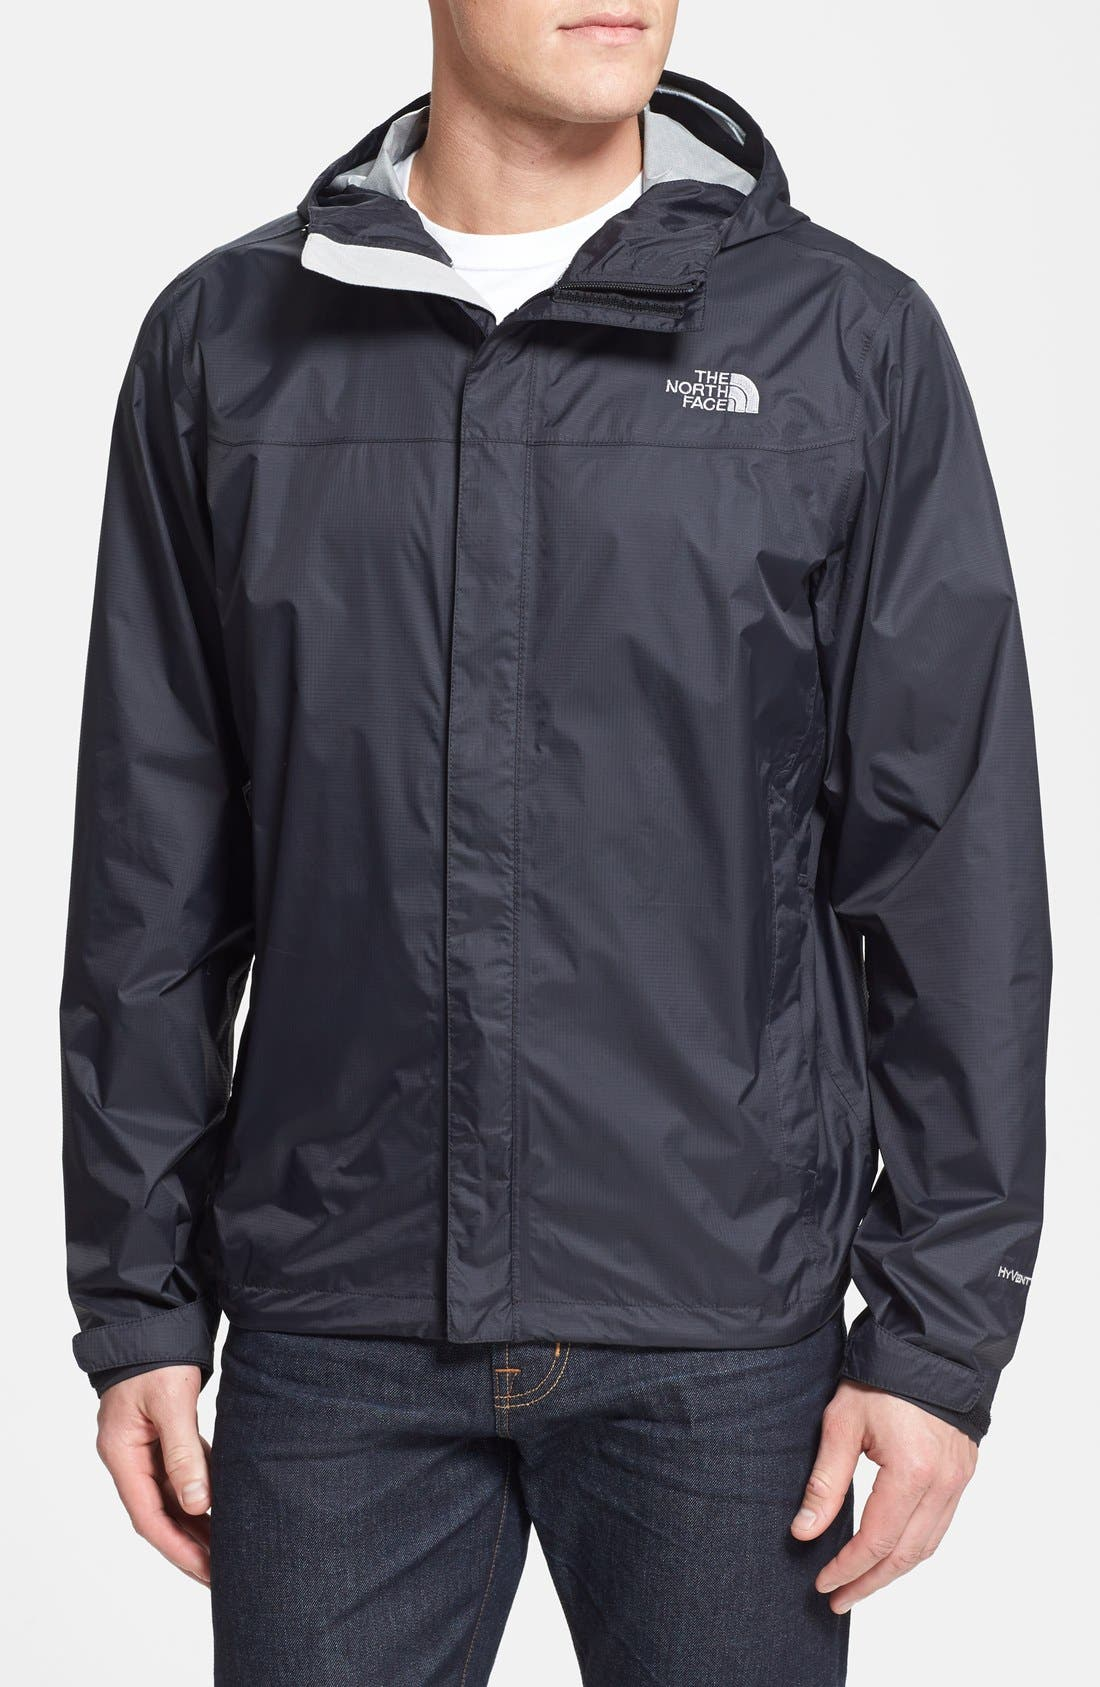 The North Face Venture Waterproof Jacket